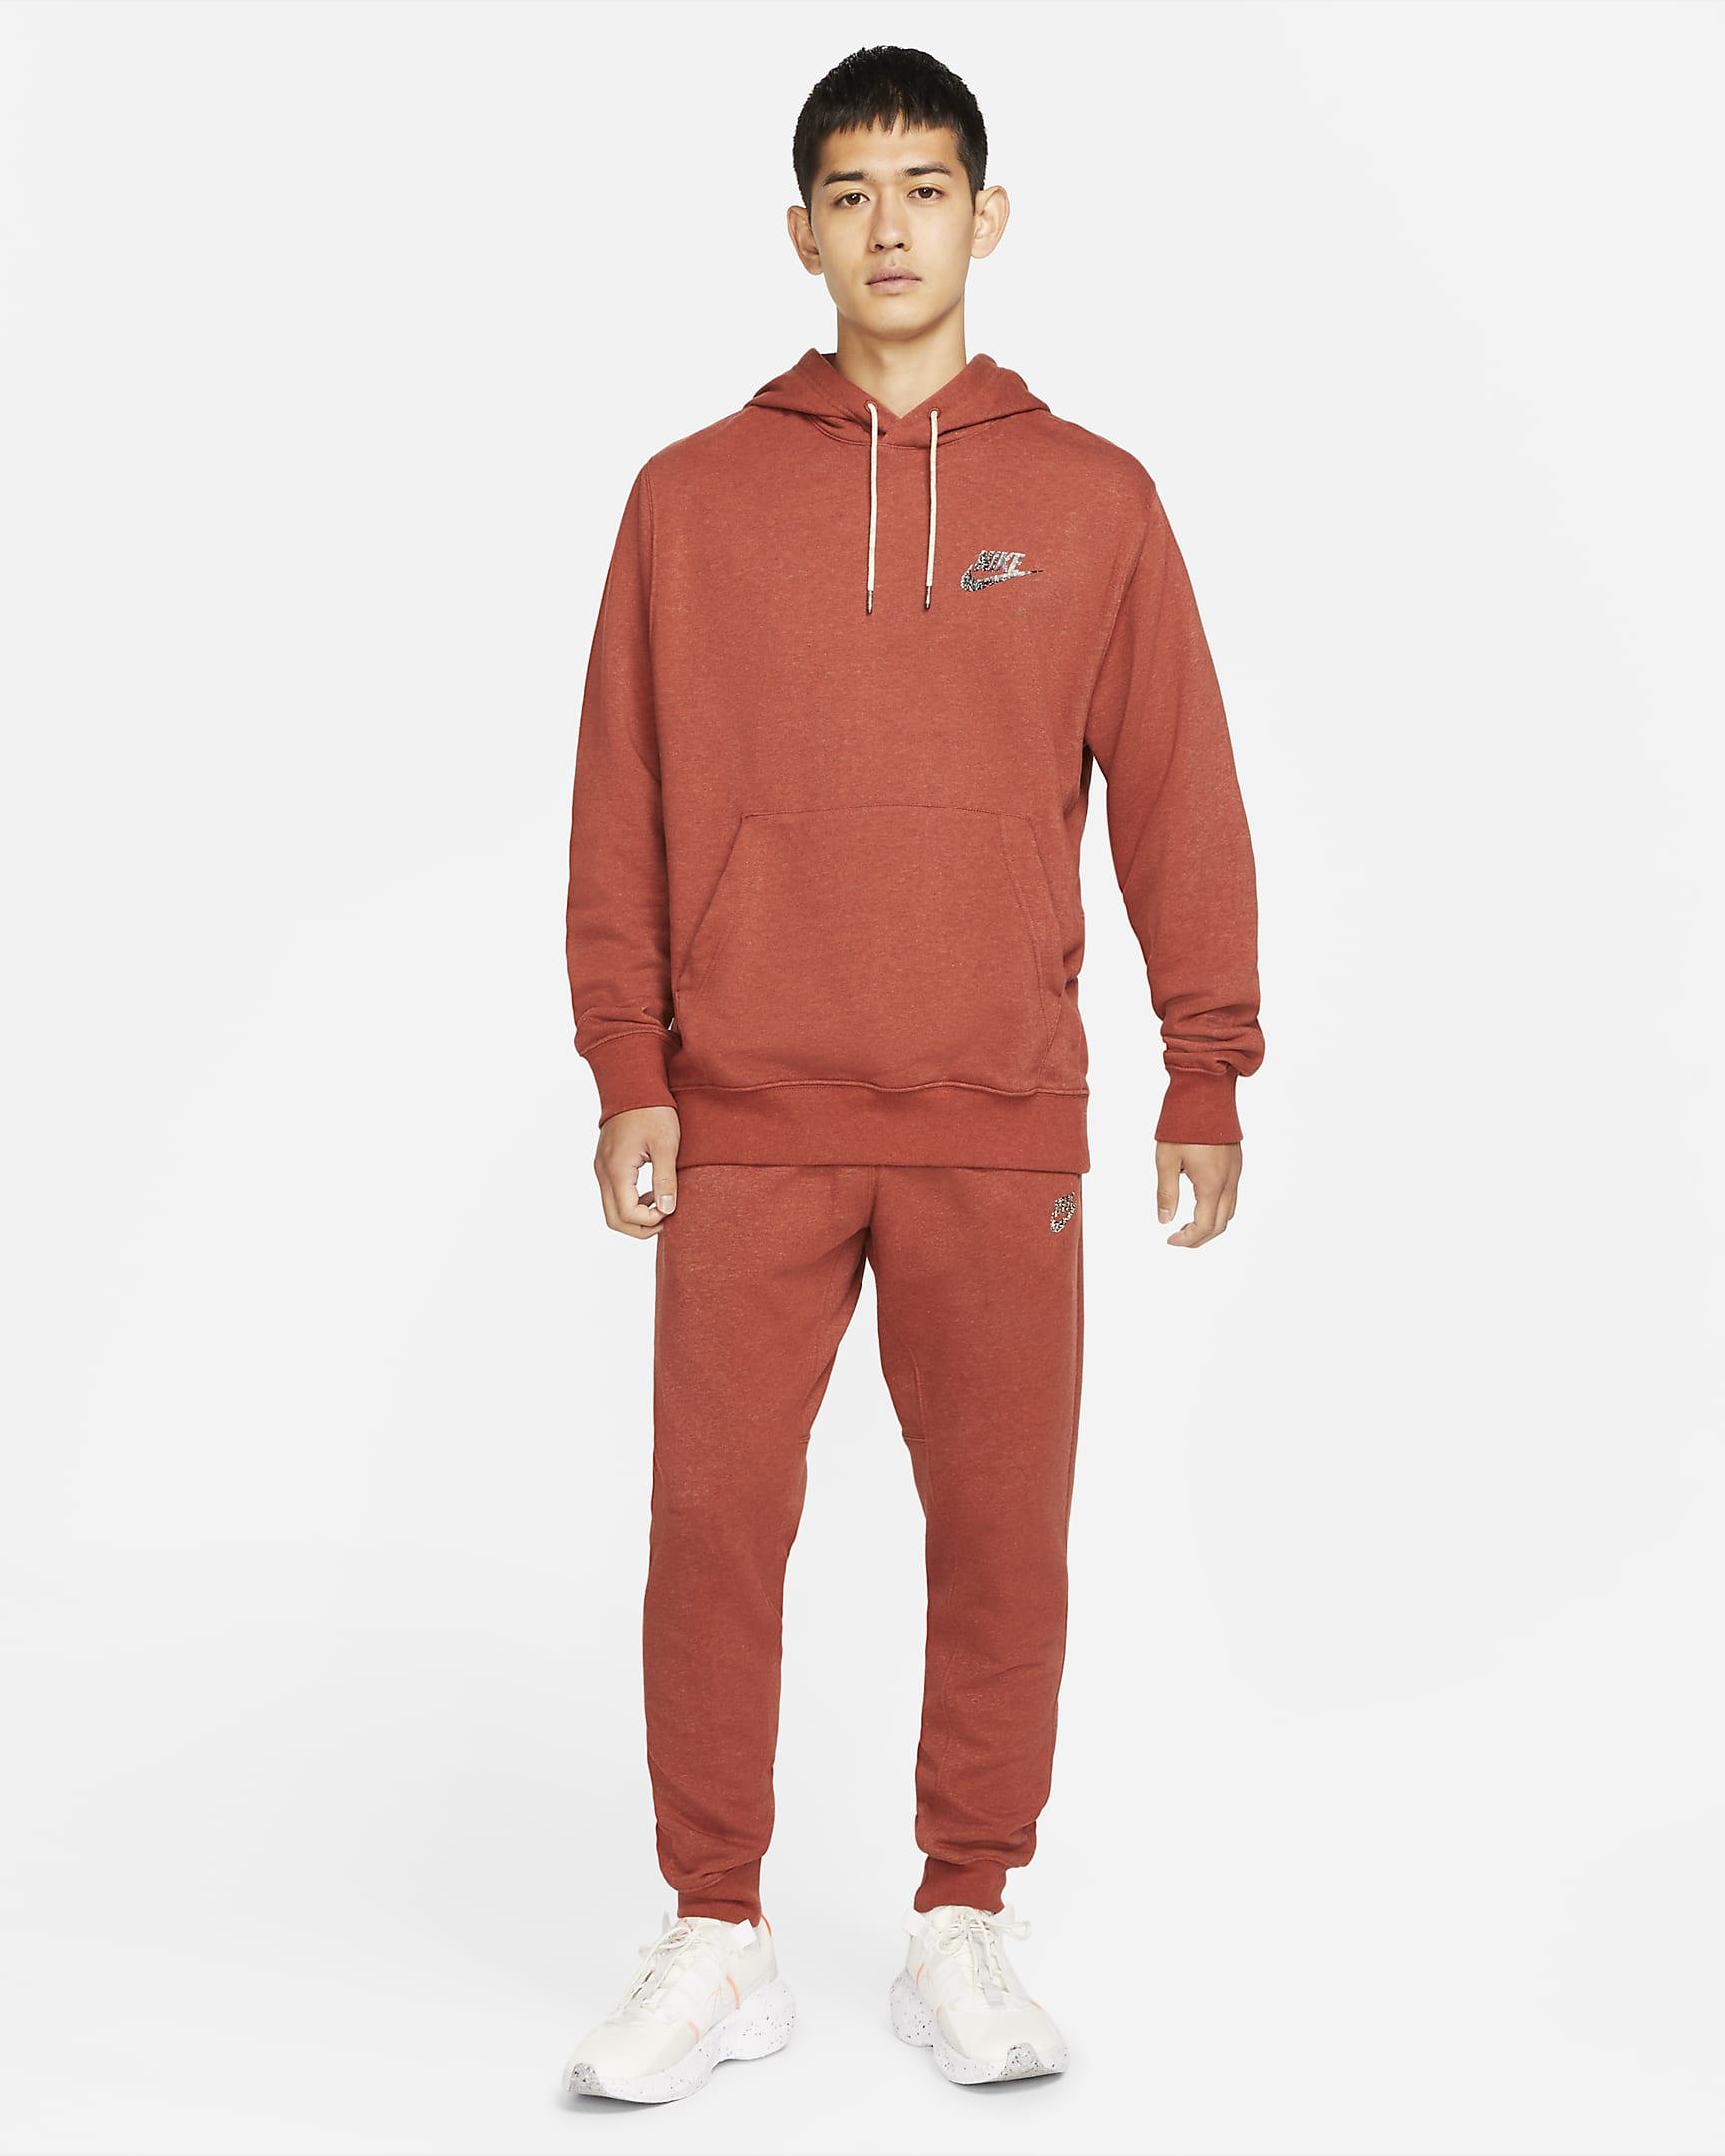 nike-sportswear-sport-essentials-mens-pullover-hoodie-XZ6DVJ-2.png